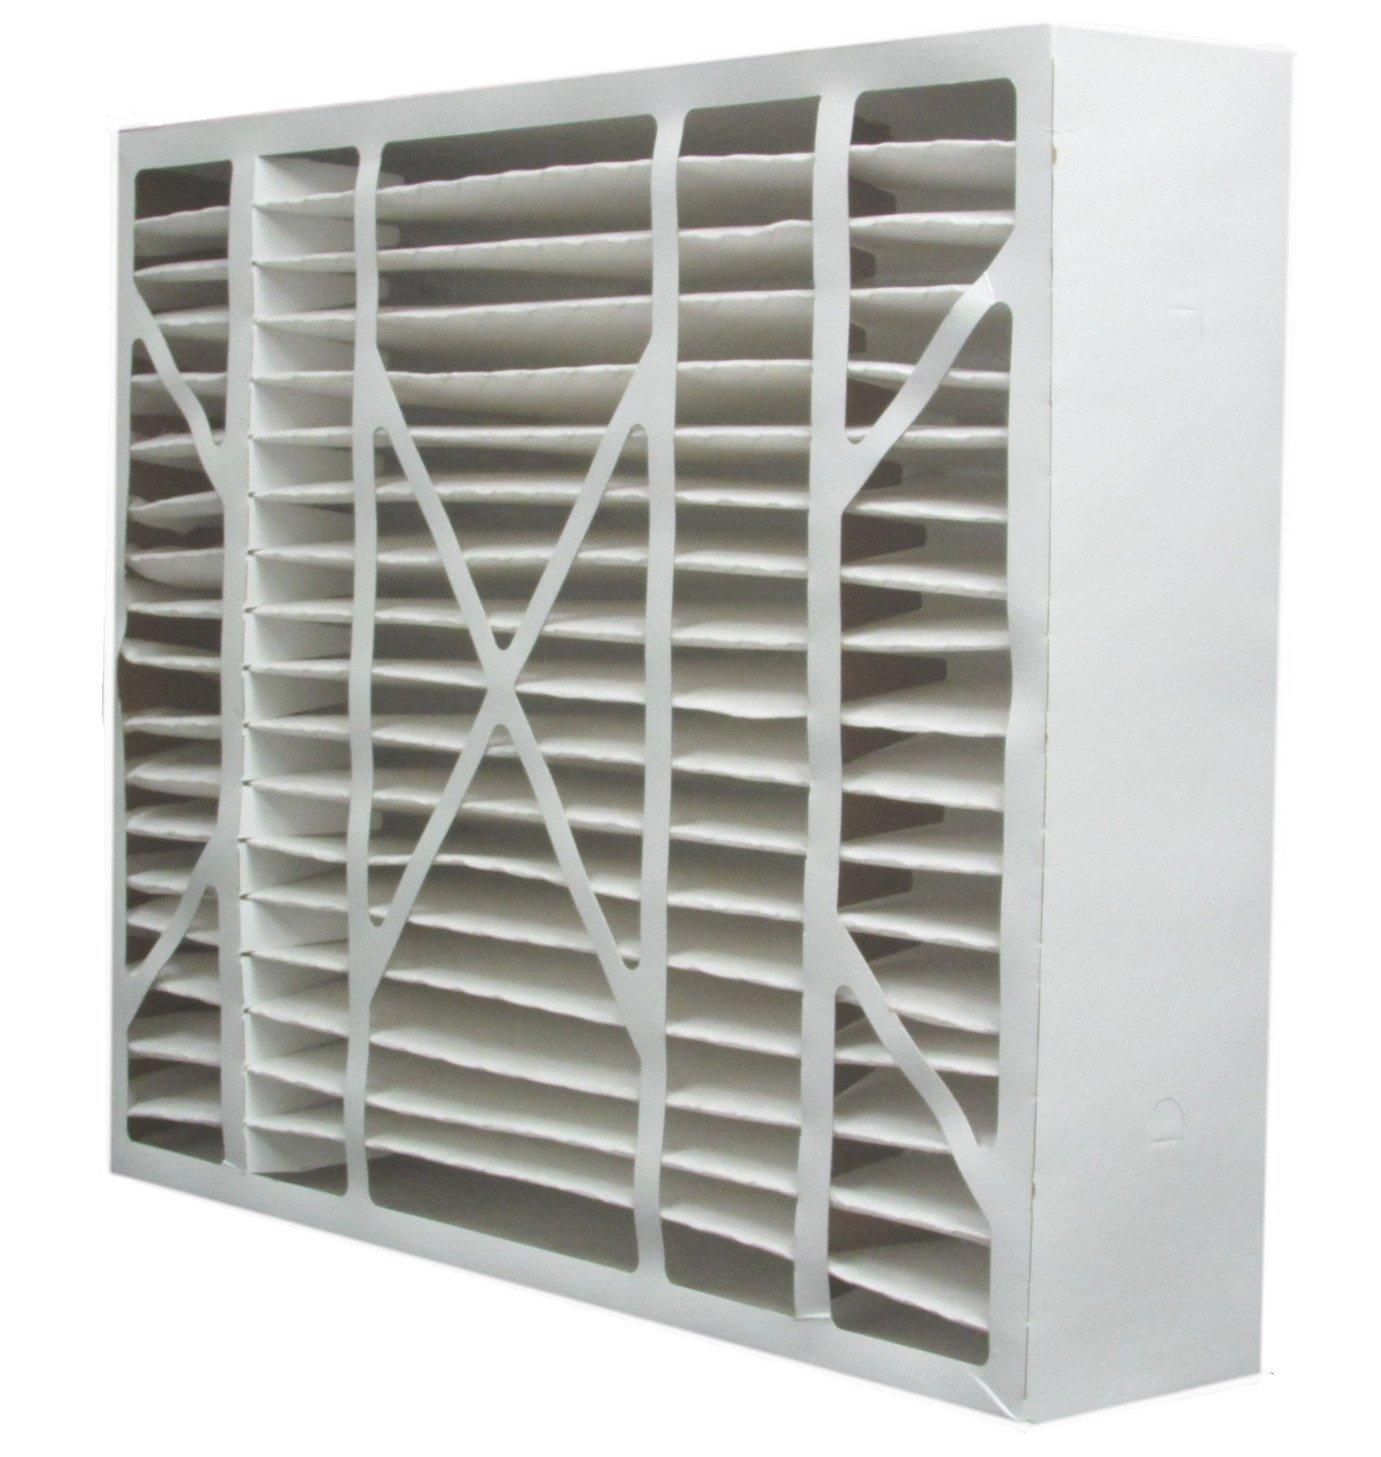 electro-airパーツ# m1 – 1056サイズ16